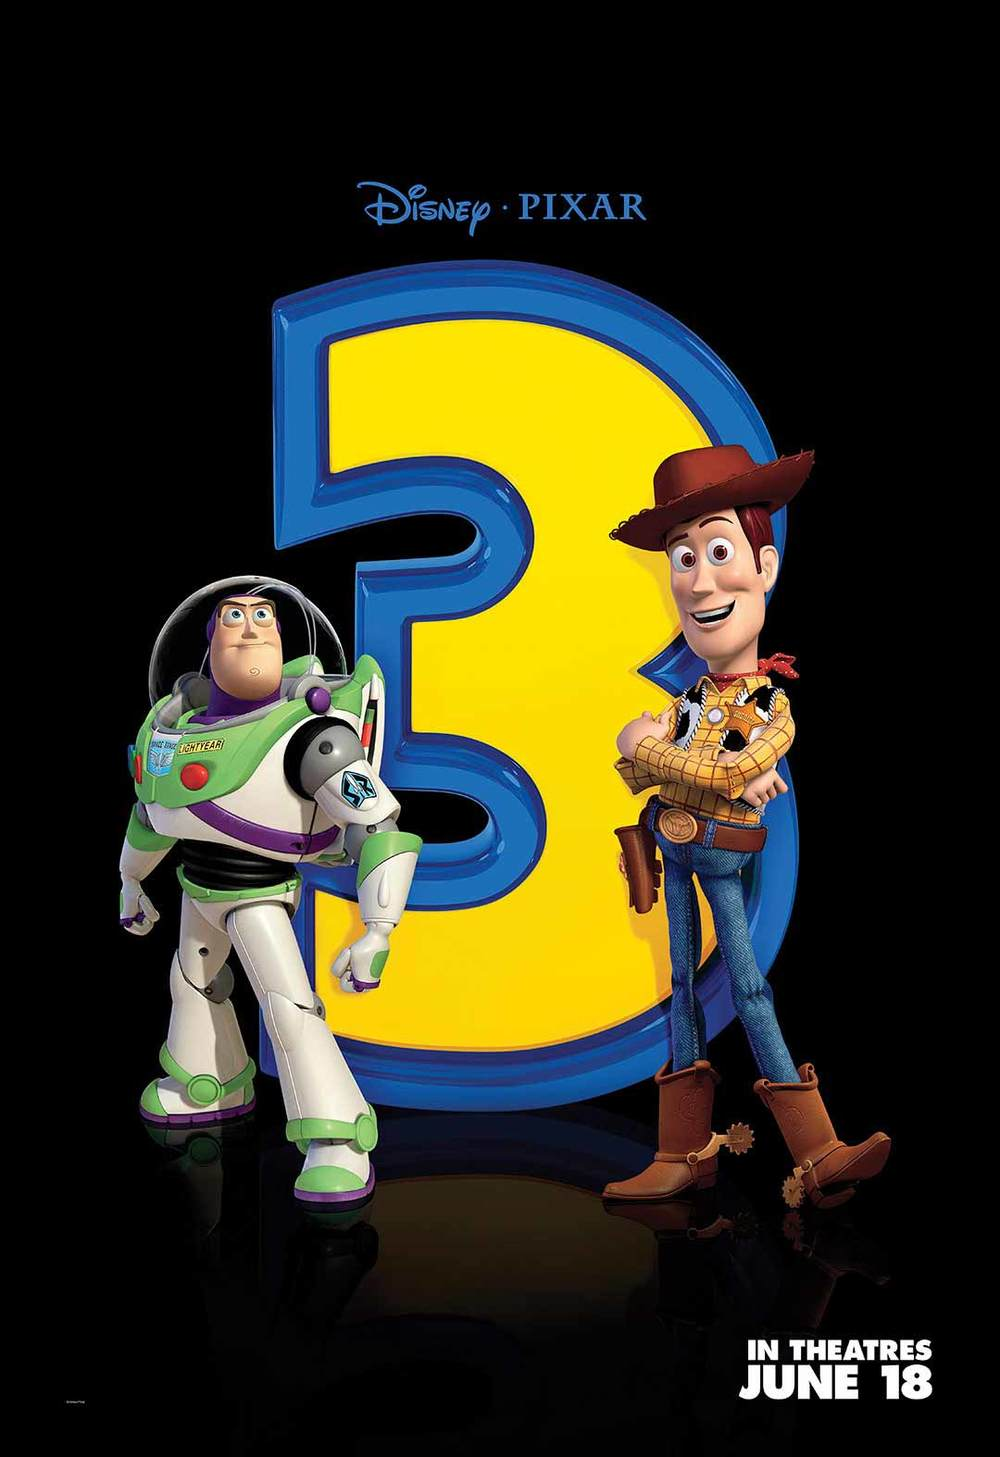 toy story films opens at walt disney studios park at disneyland paris